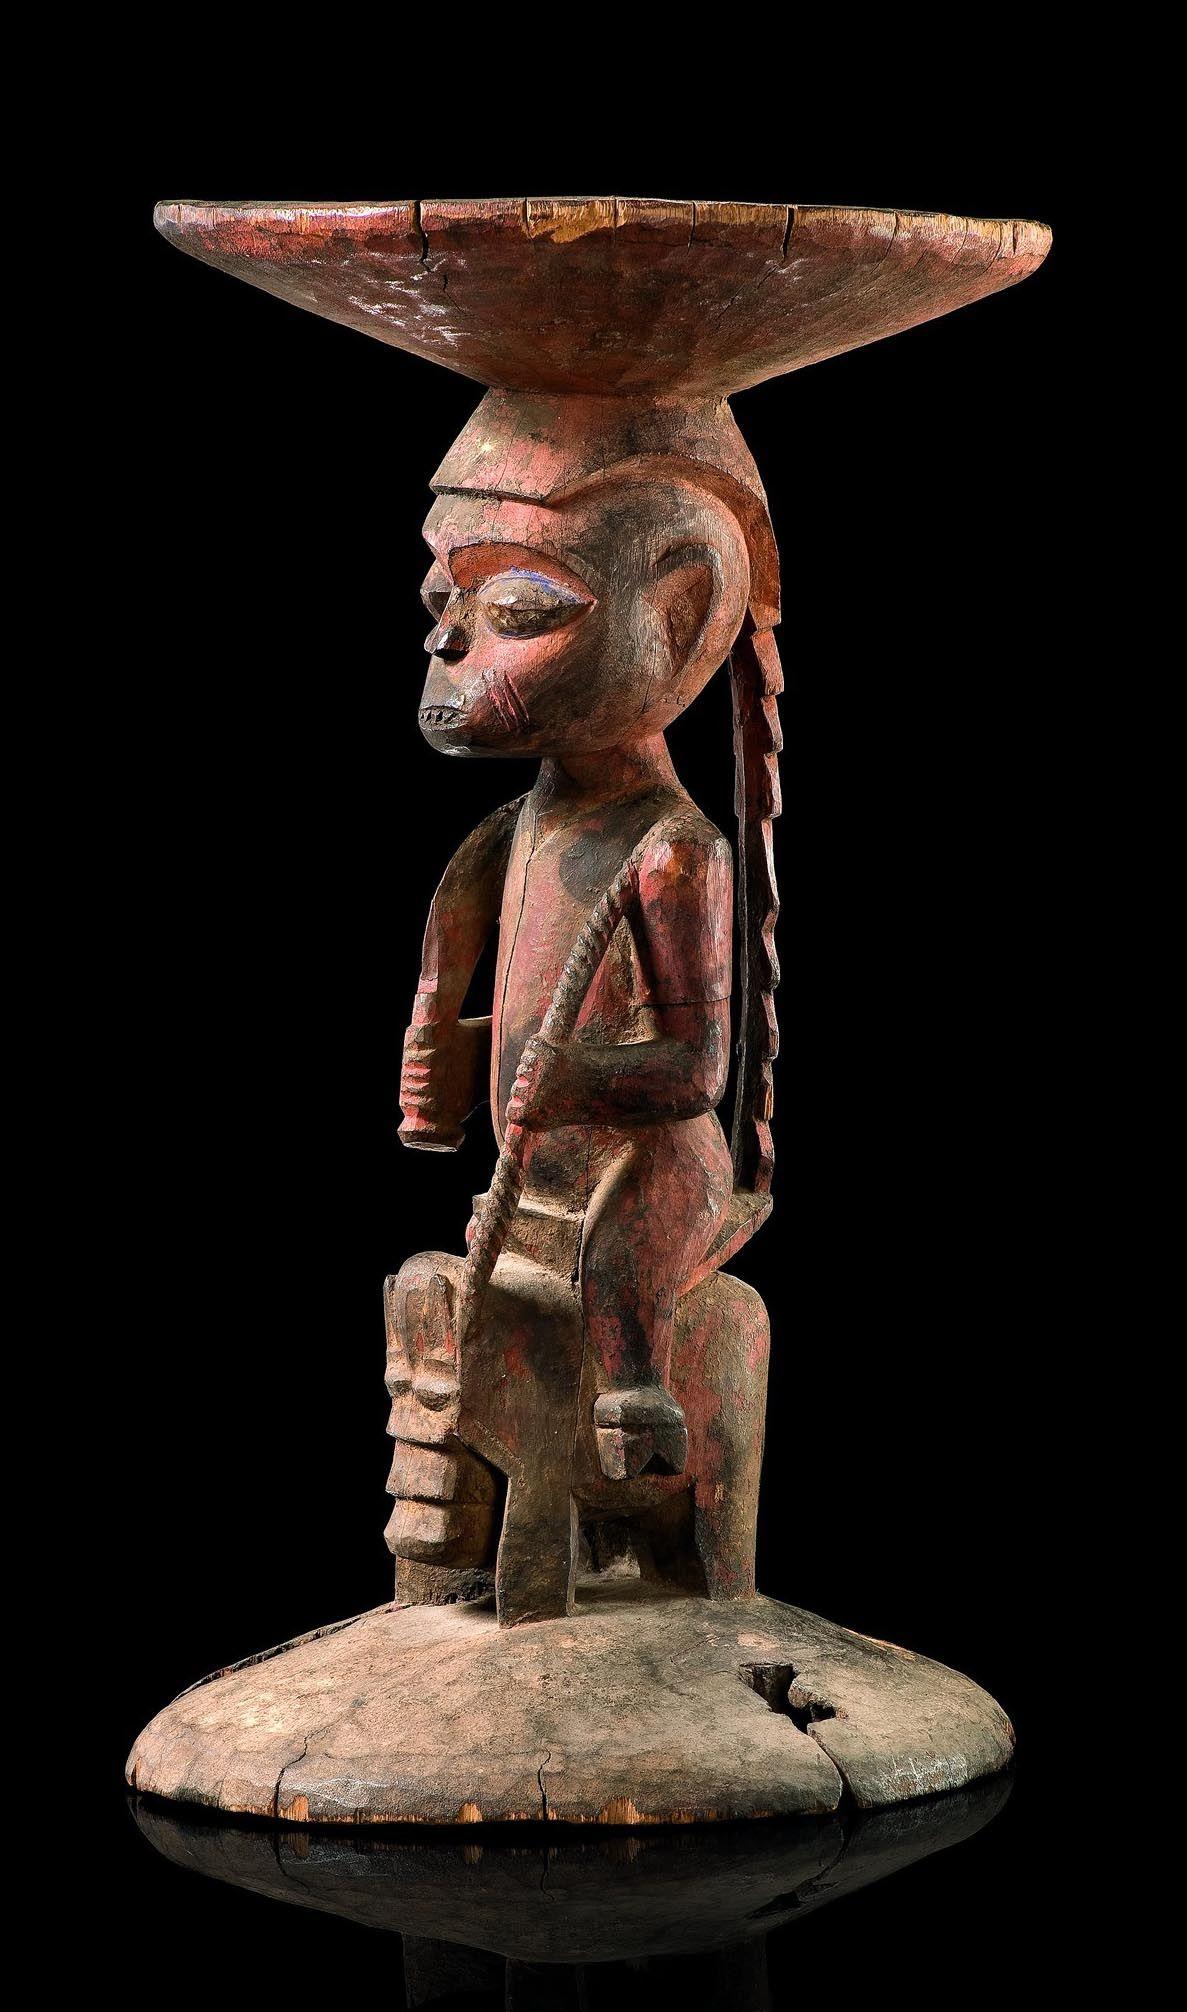 Africa Stool from the Yoruba people of the Ijebu region of Nigeria